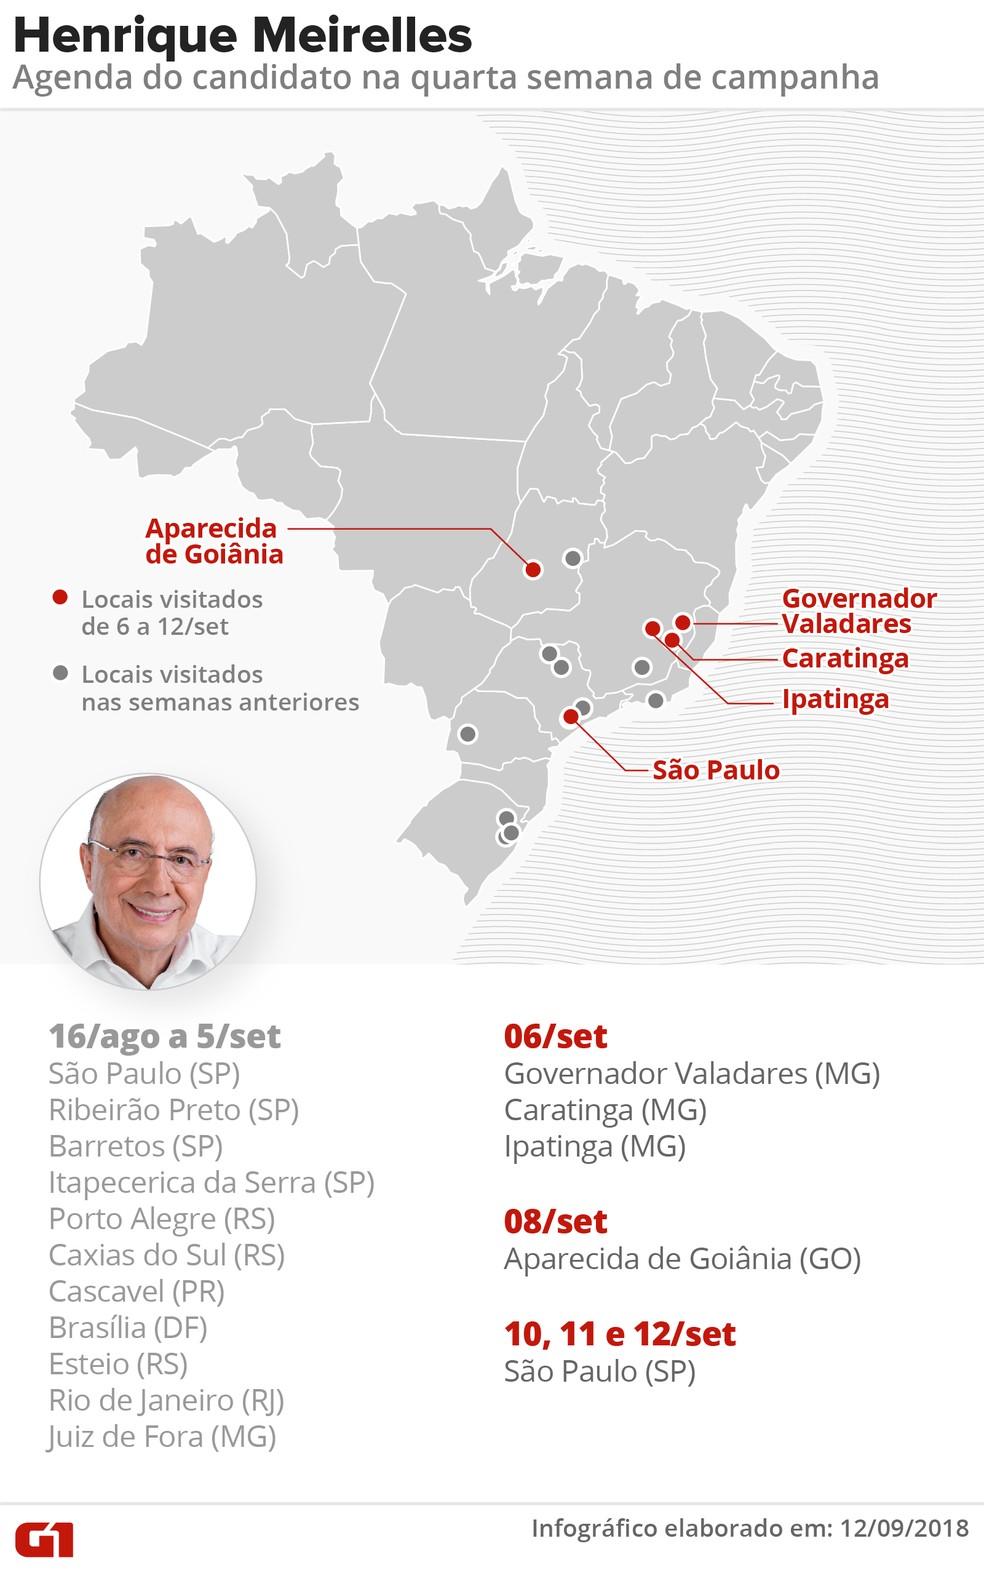 Agendas do candidato Henrique Meirelles (MDB) na 4ª semana de campanha presidencial — Foto: Roberta Jaworski/G1